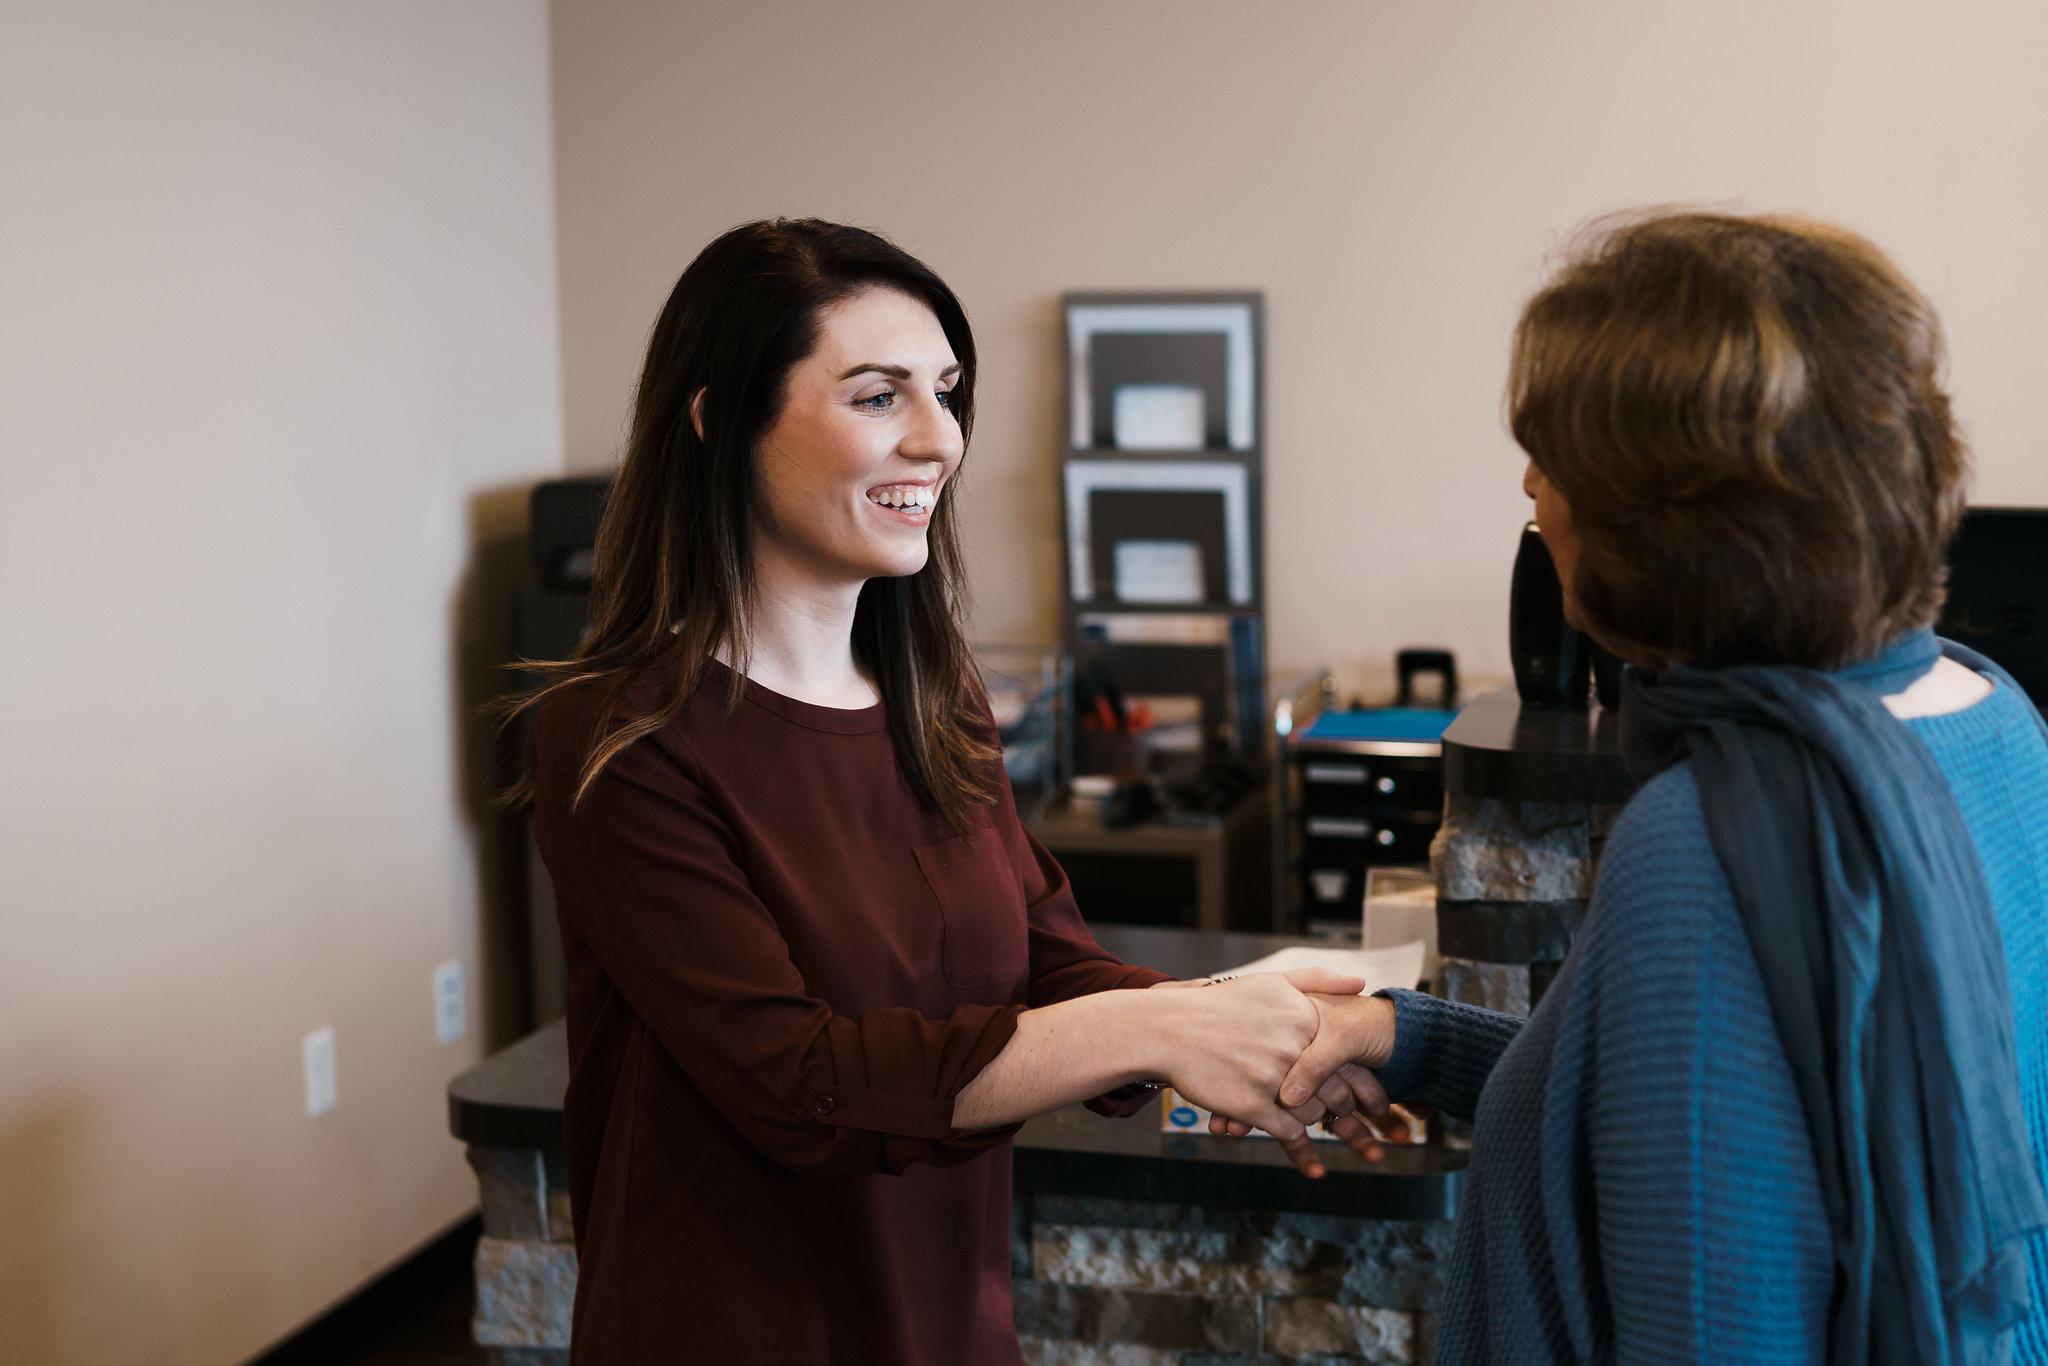 Arbor Vitae office management greets customer